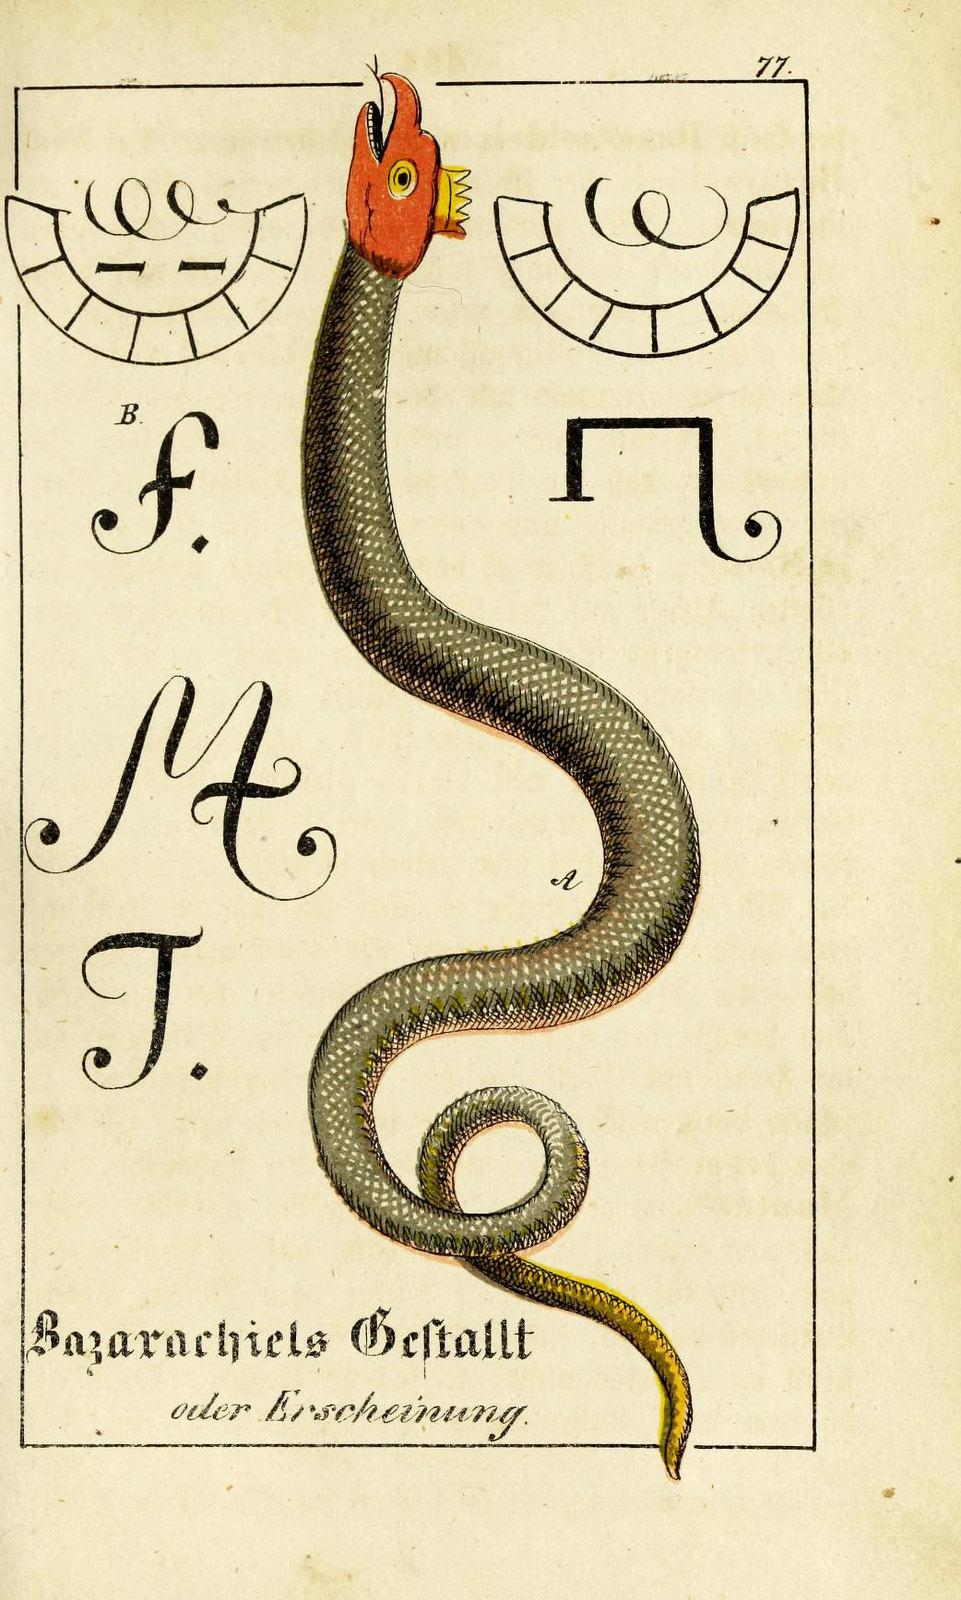 Johann Scheible - Doktor Johannes Faust's Magia naturalis et innaturalis, 1849 (15)